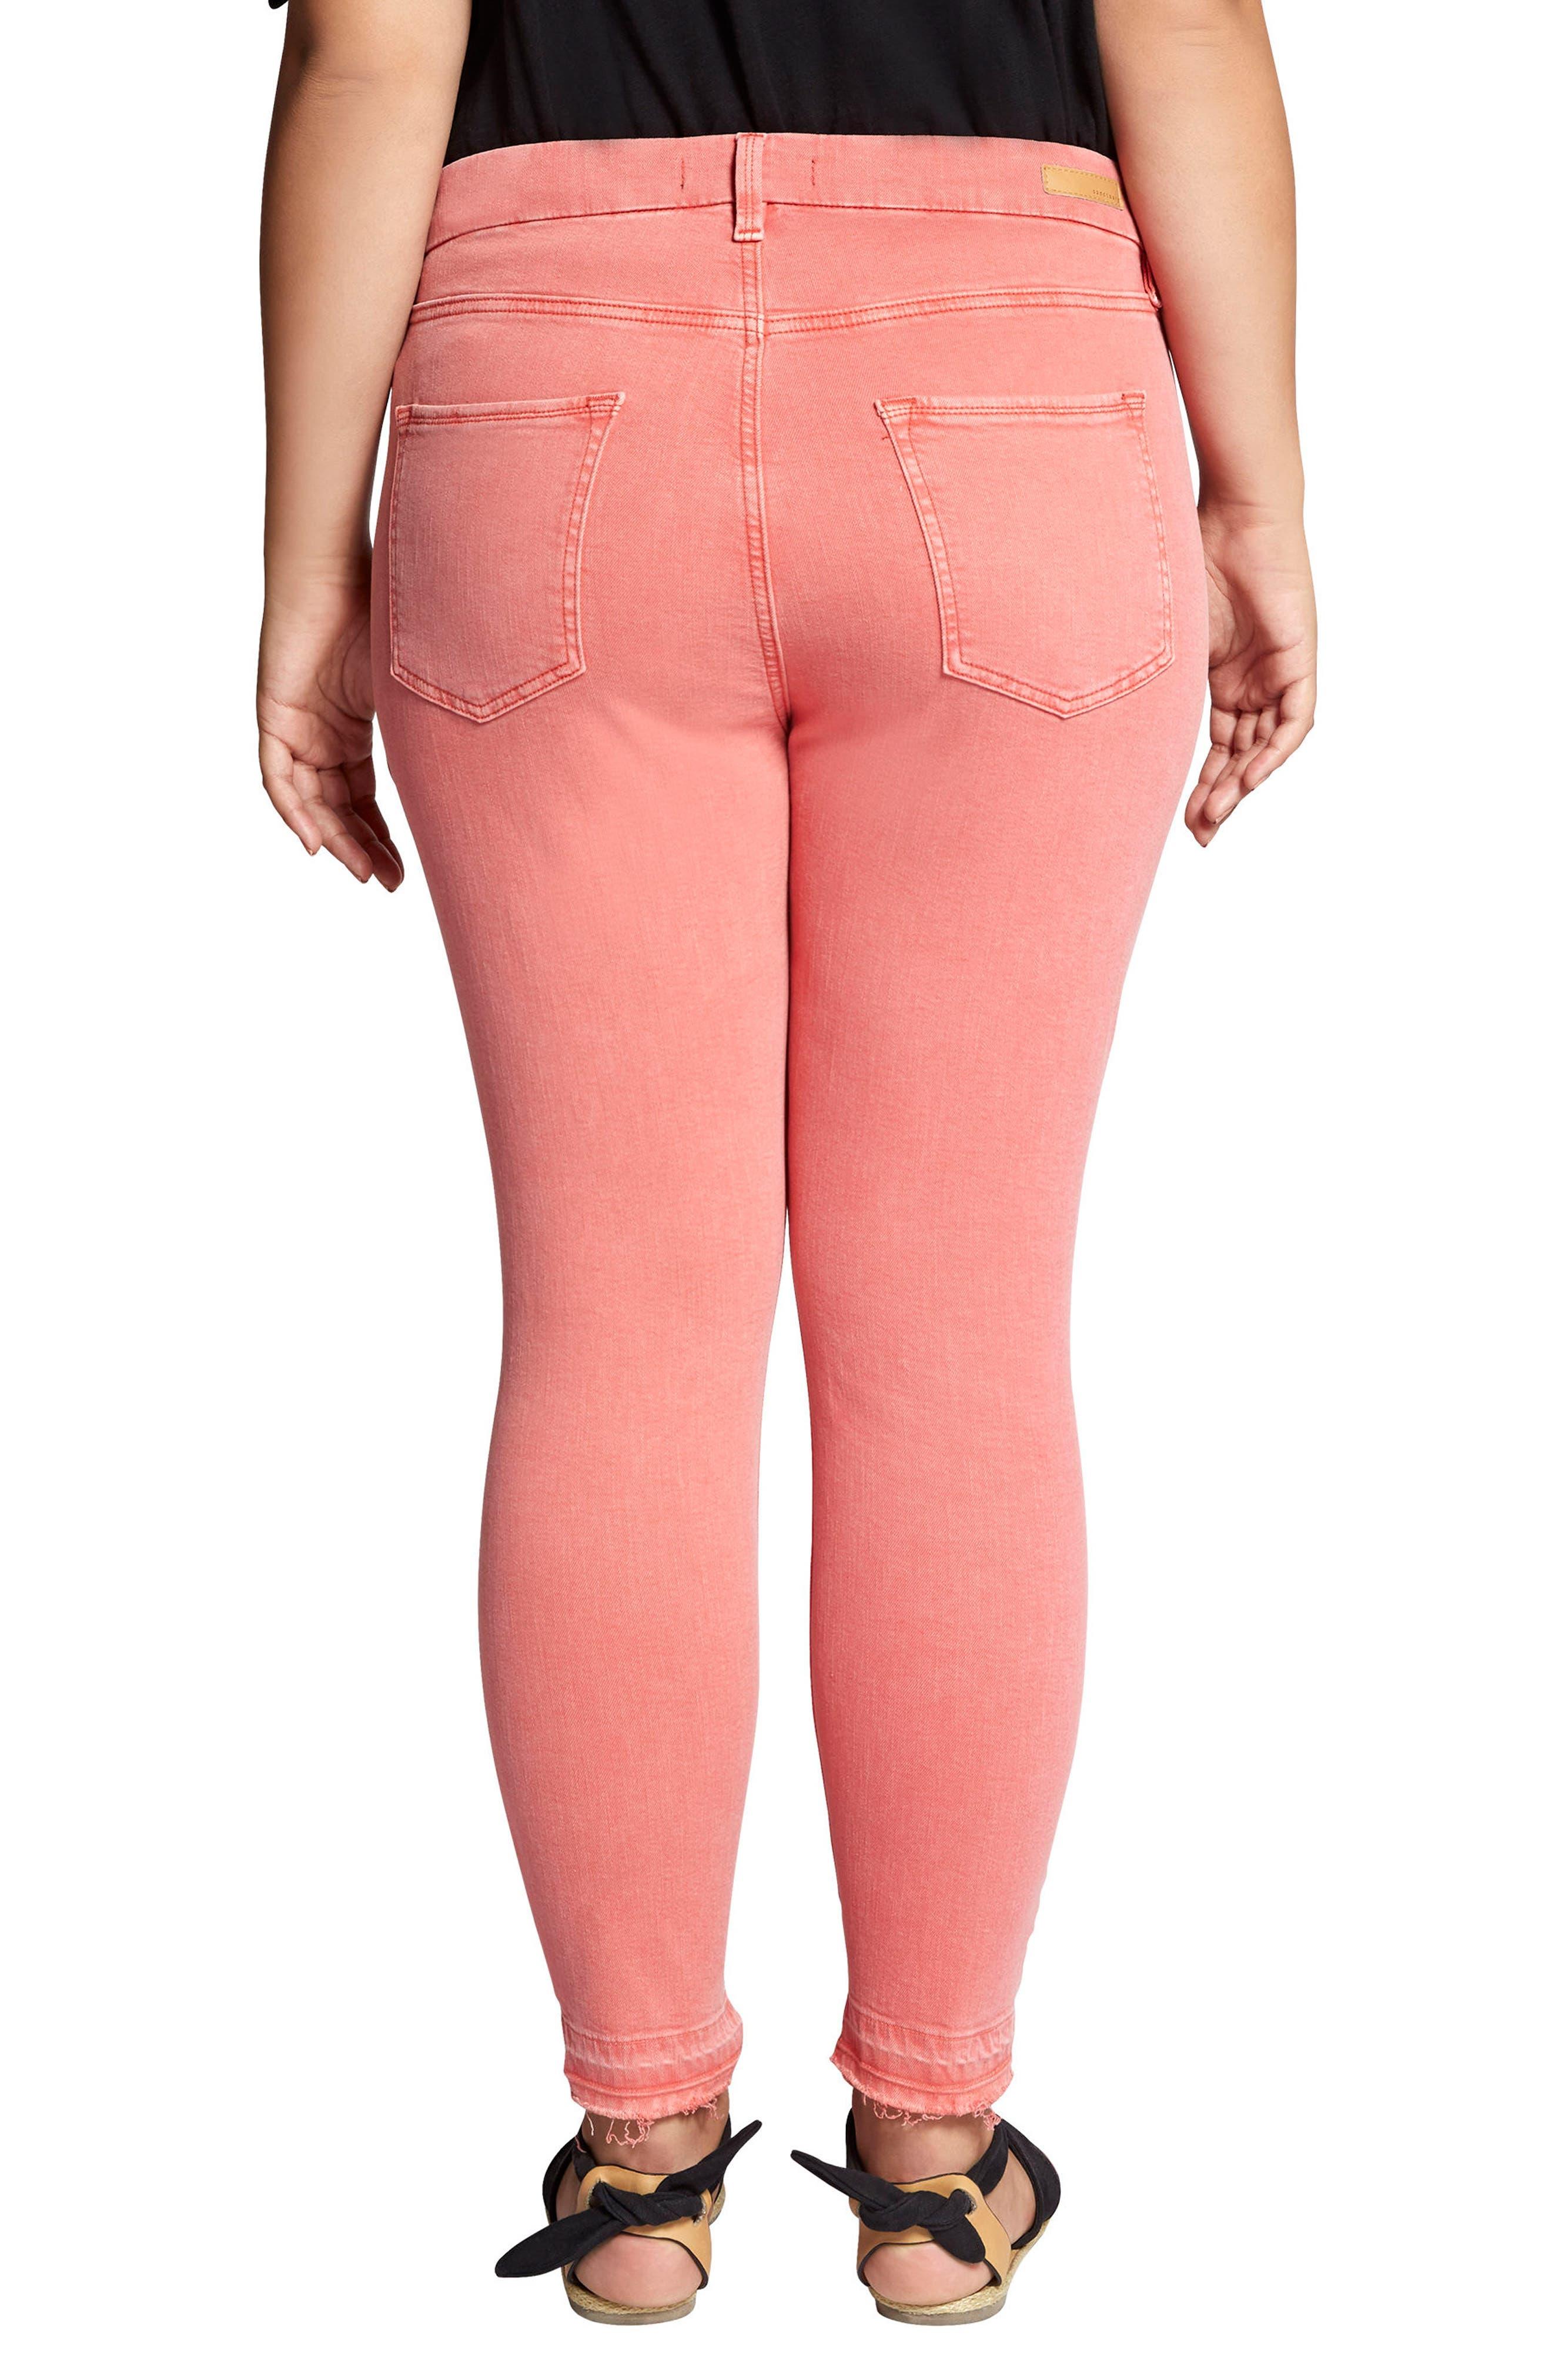 Saige Release Hem Curvy Fit Skinny Jeans,                             Alternate thumbnail 2, color,                             CHILI WASH